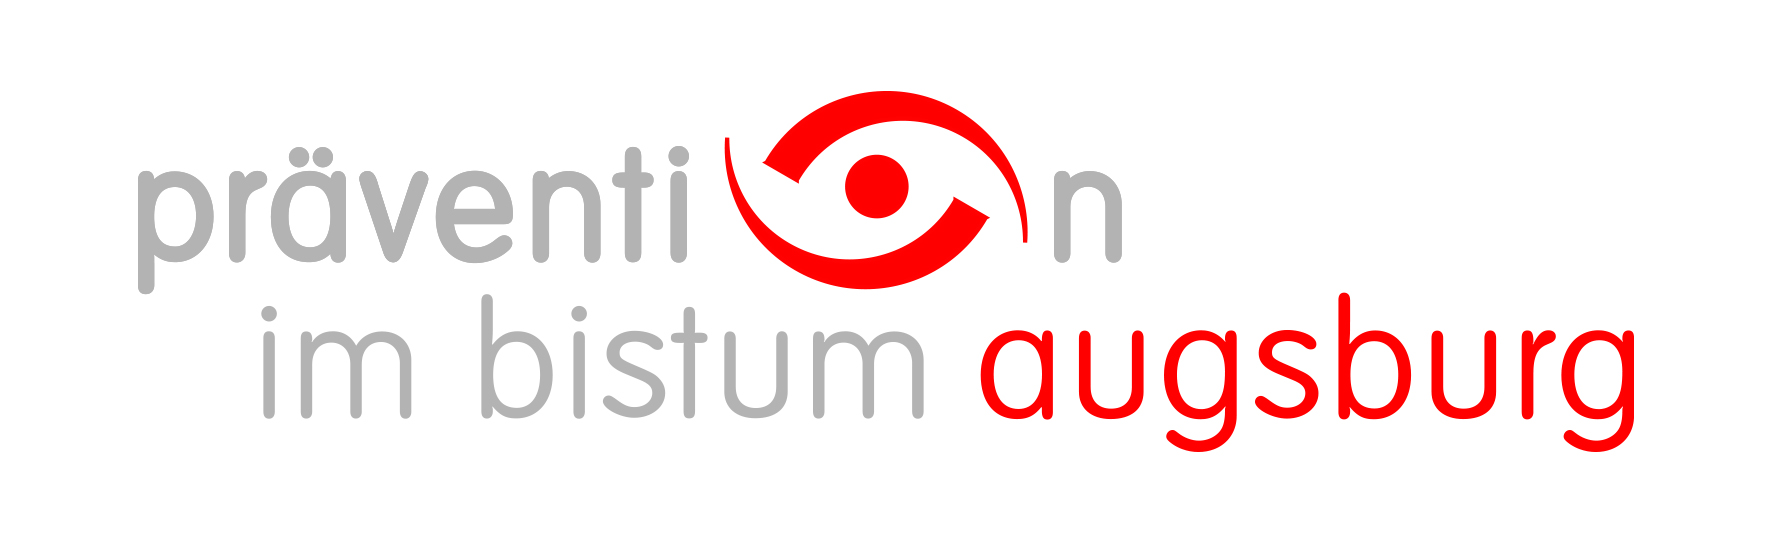 logo_praev_bistum_augsburg